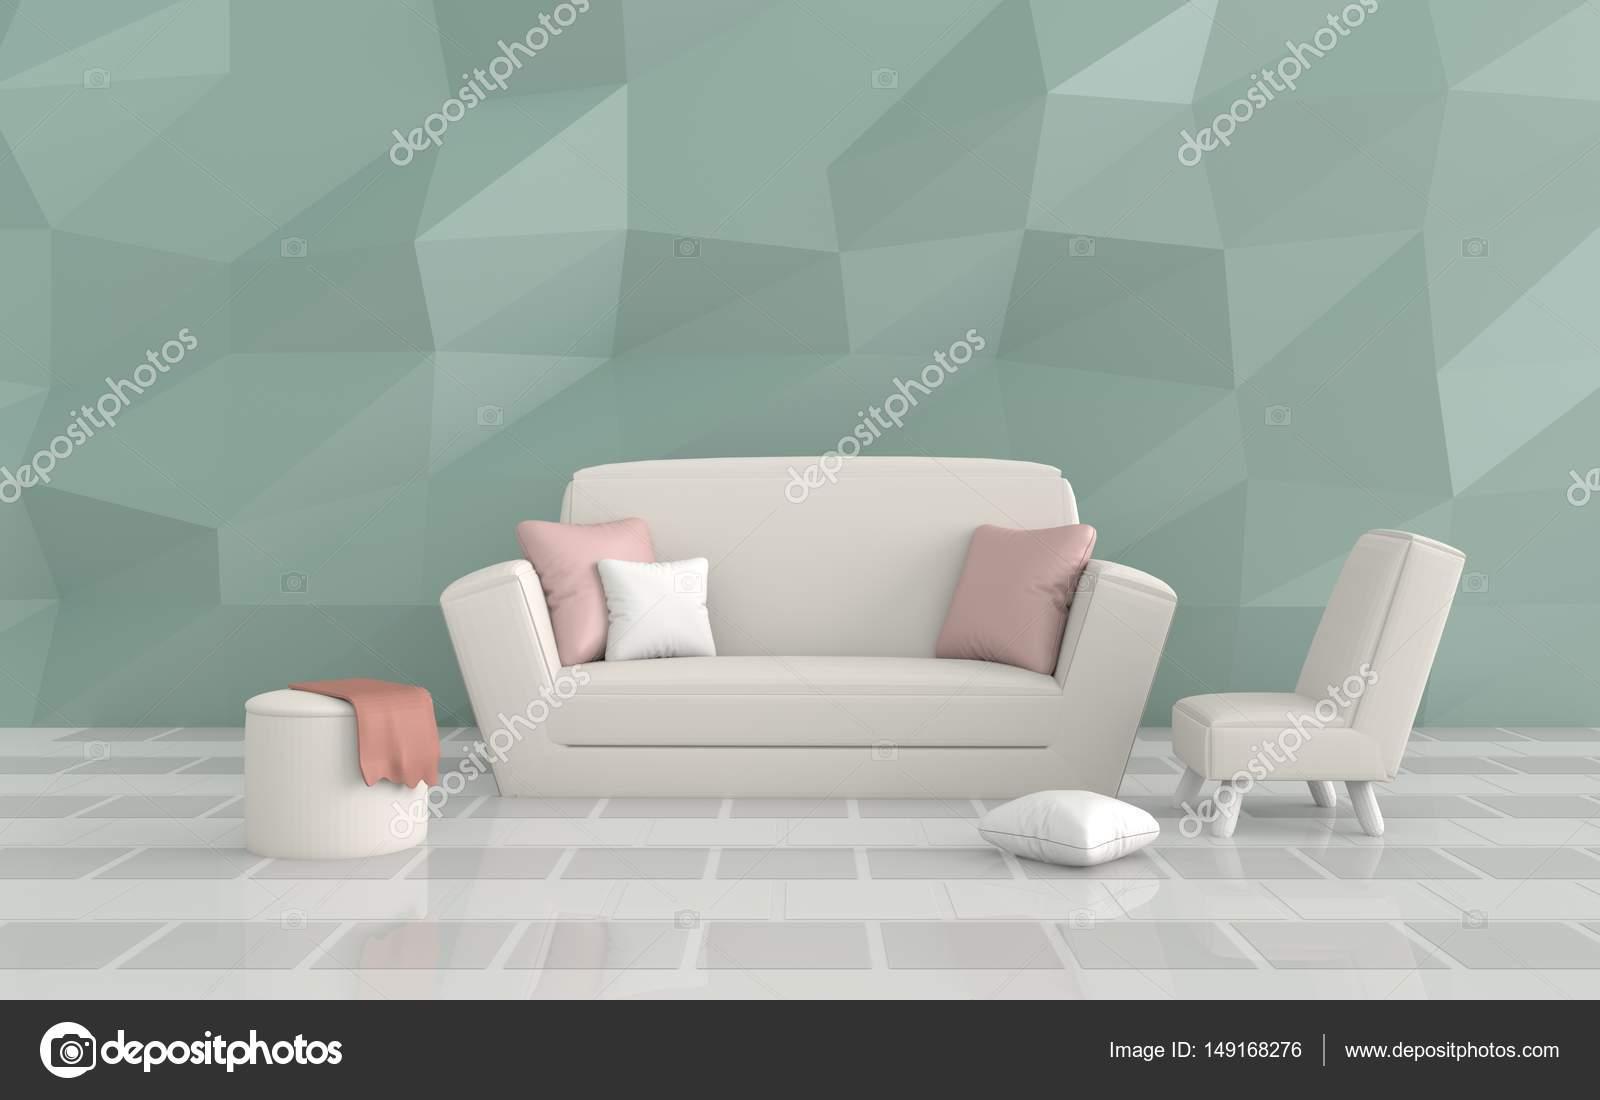 De woonkamer is ingericht kussens sofa stoel groene cement